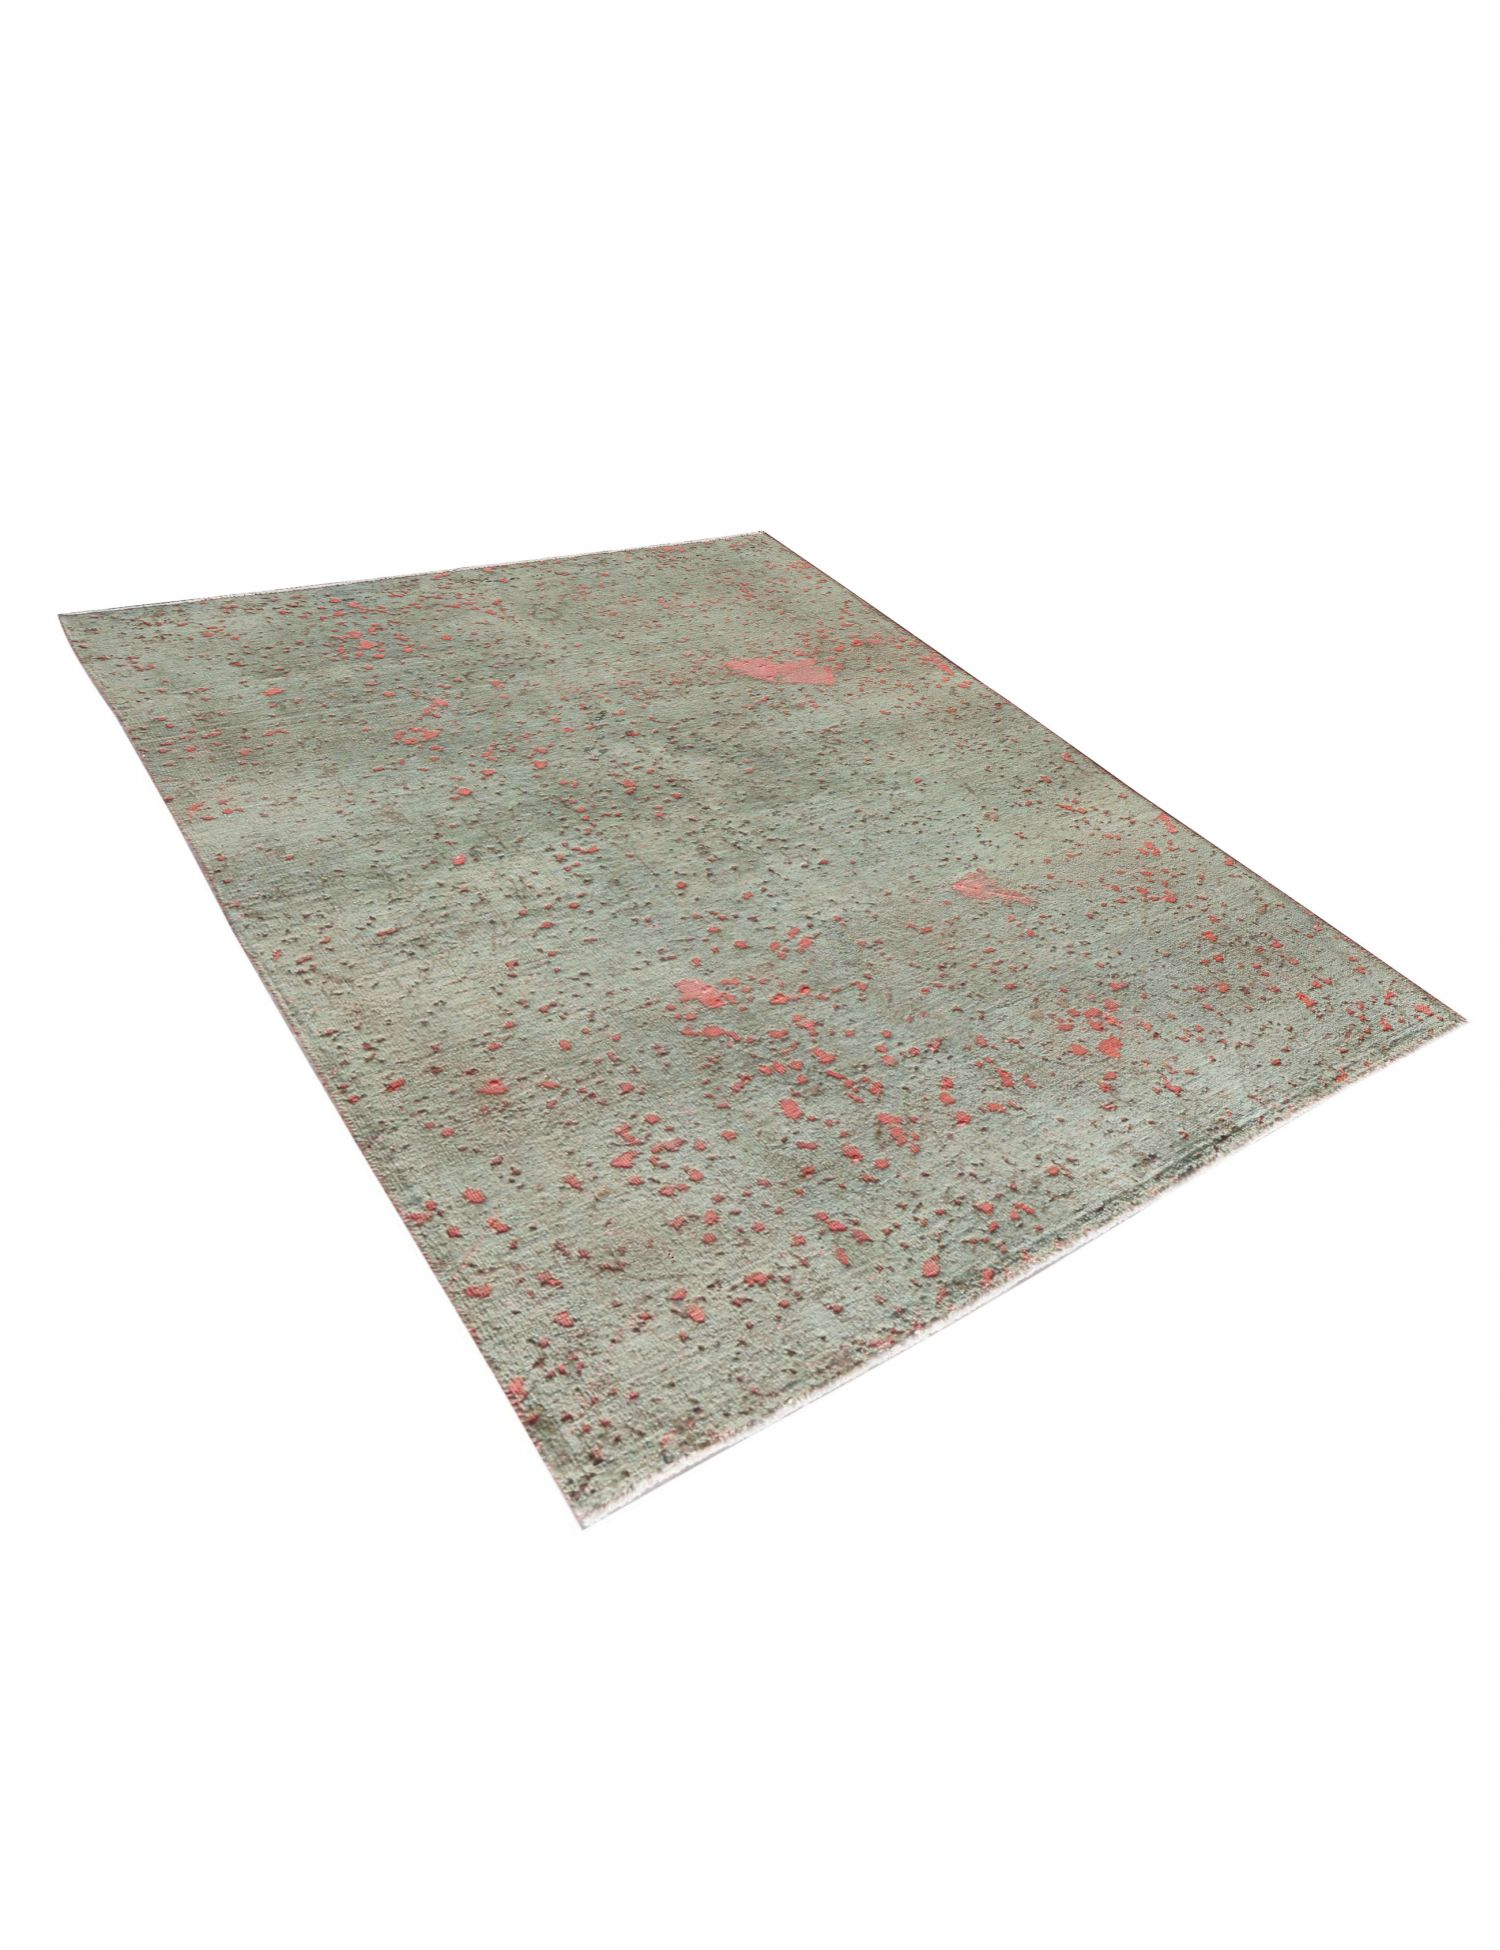 Vintage Perserteppich  grau <br/>176 x 131 cm